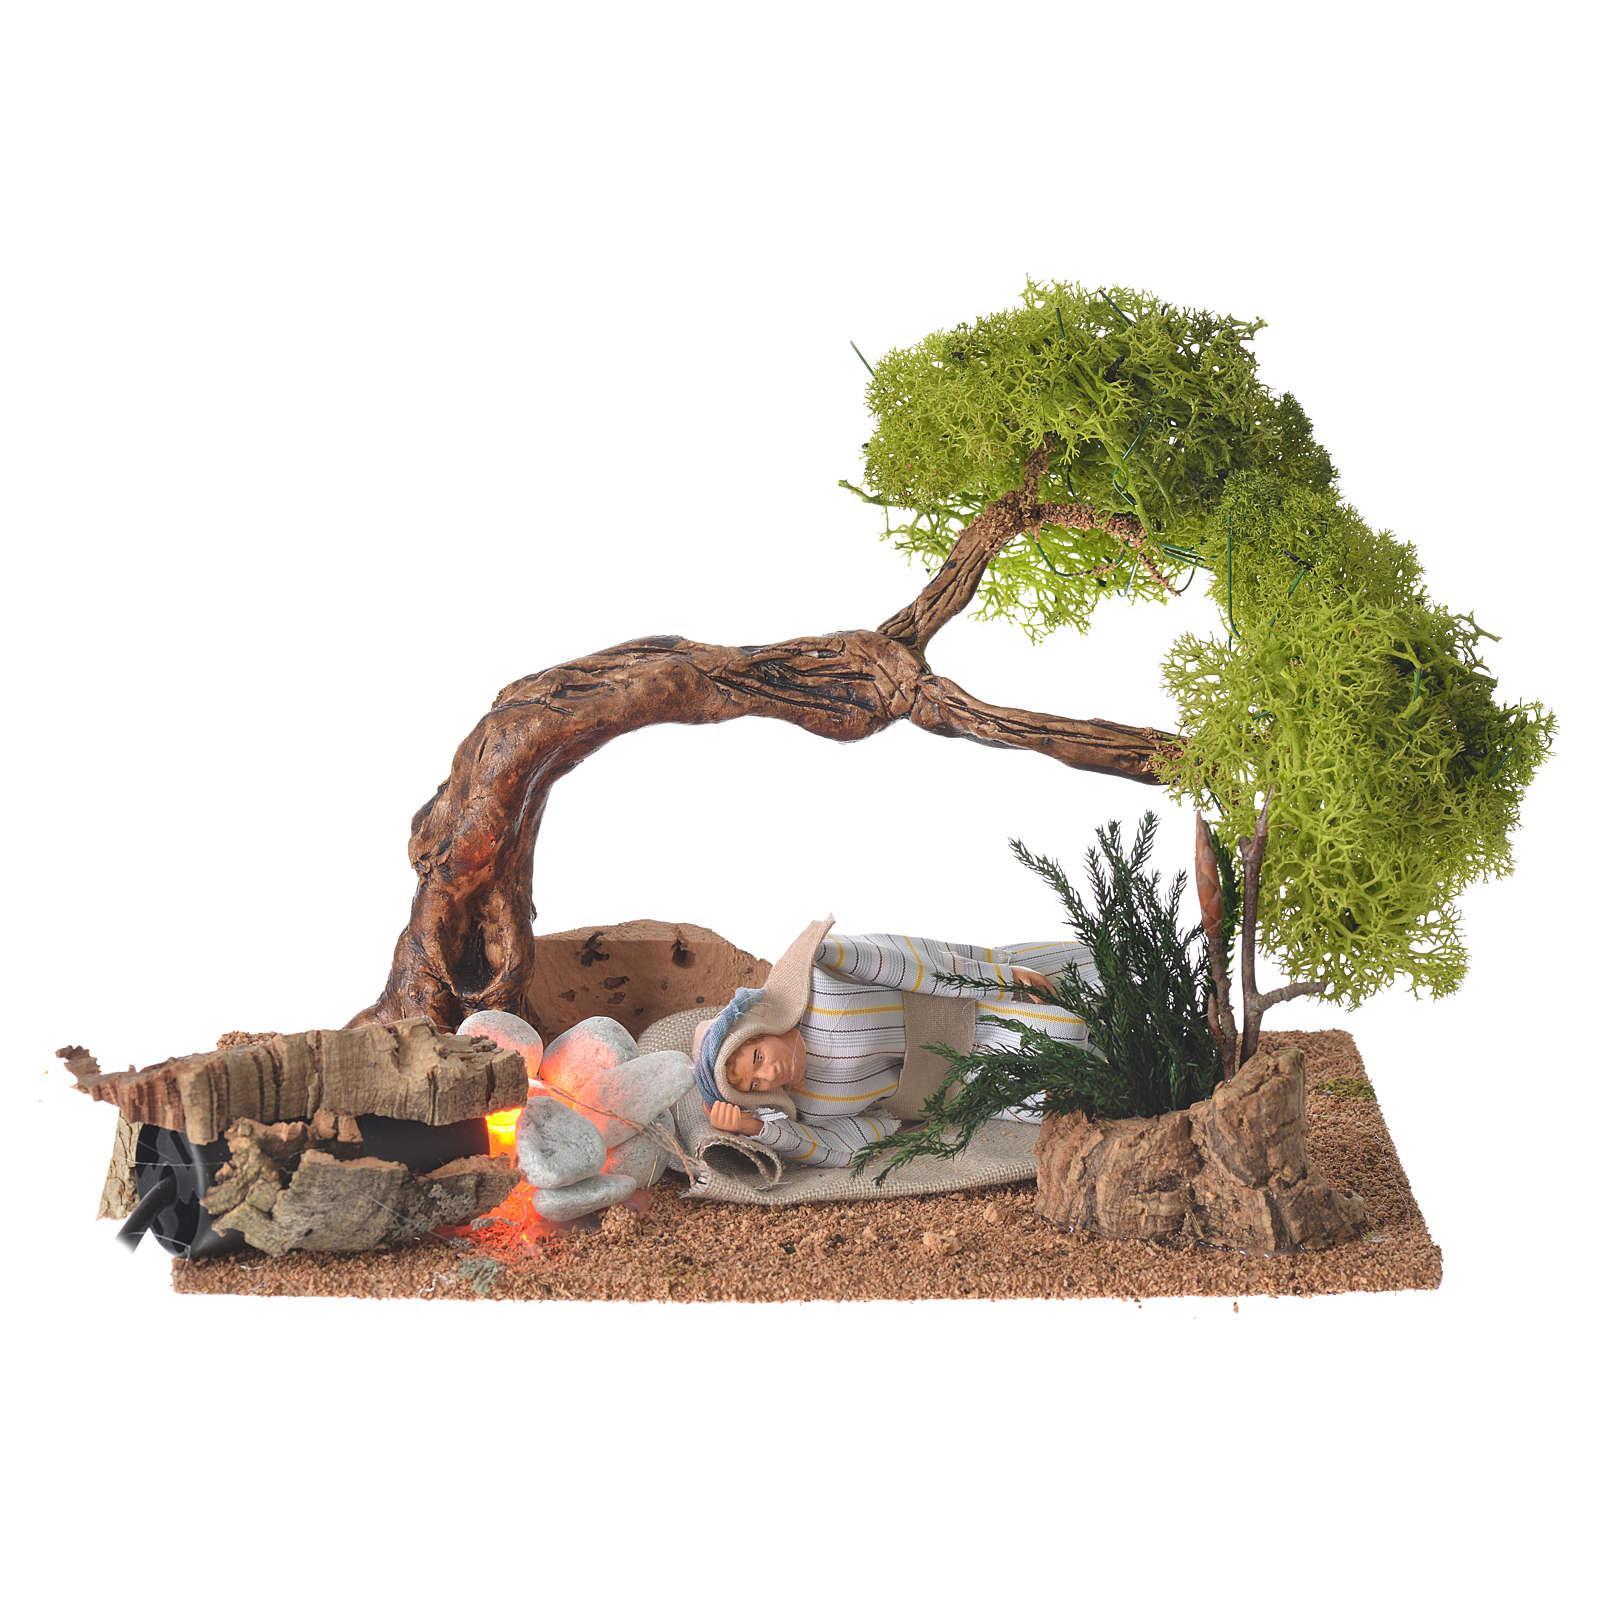 Dormiente arabo 10 cm con fuoco e quercia 4